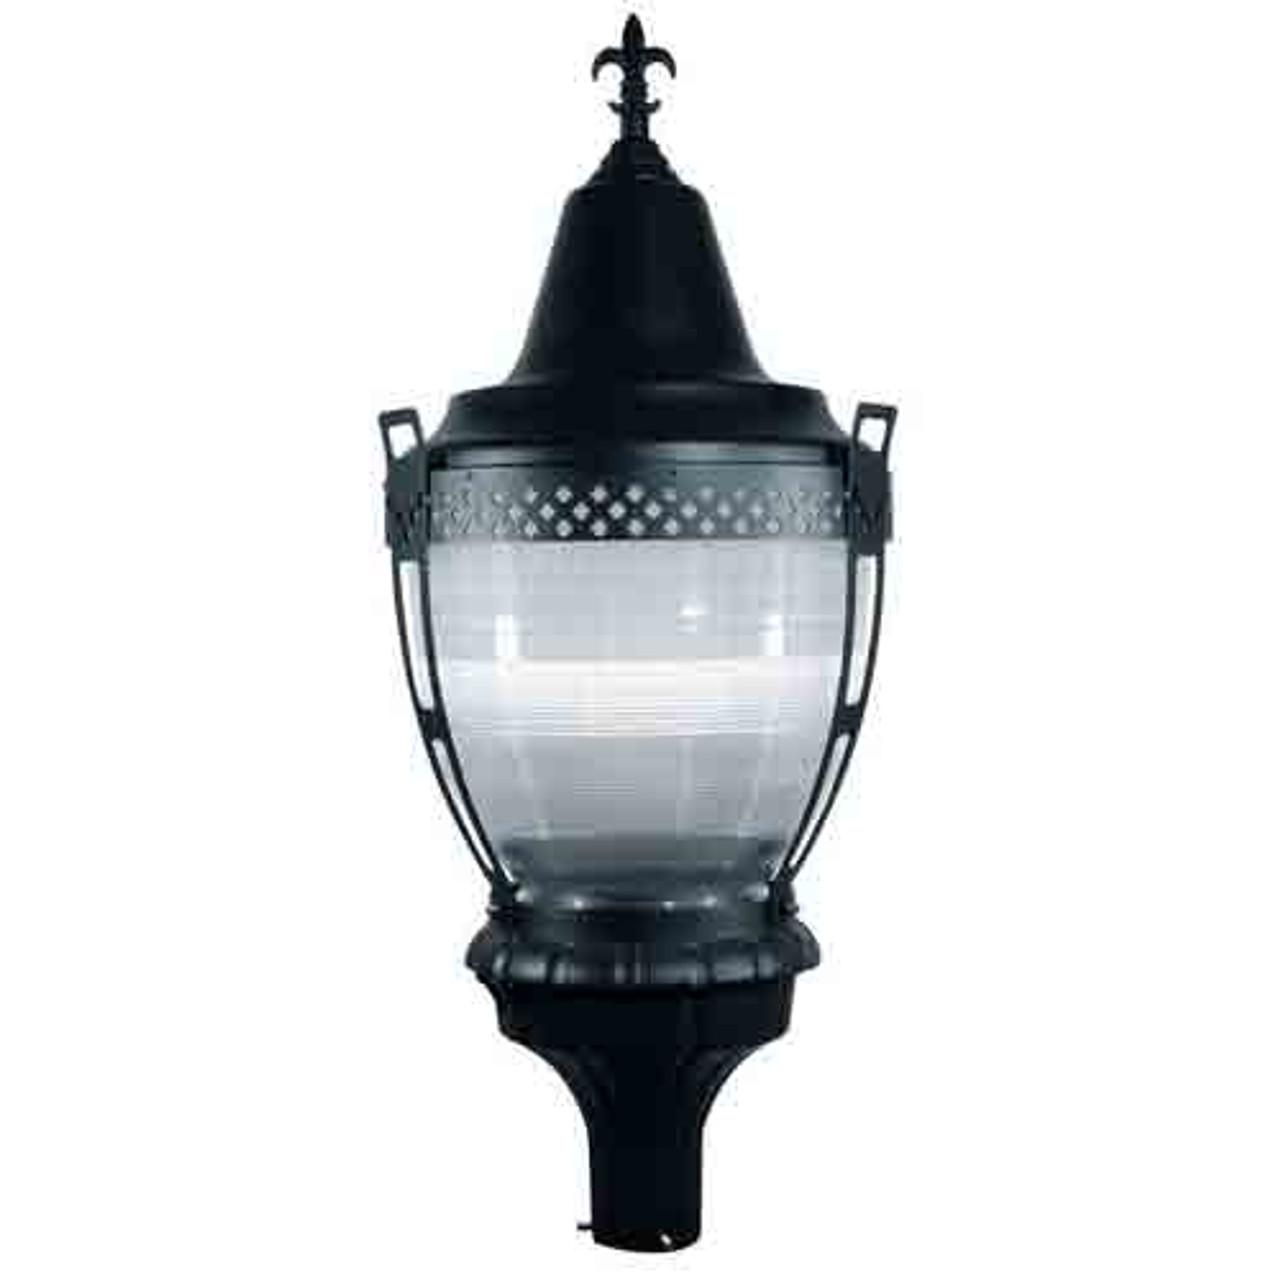 Bostonian Historic Premium Post Top Light